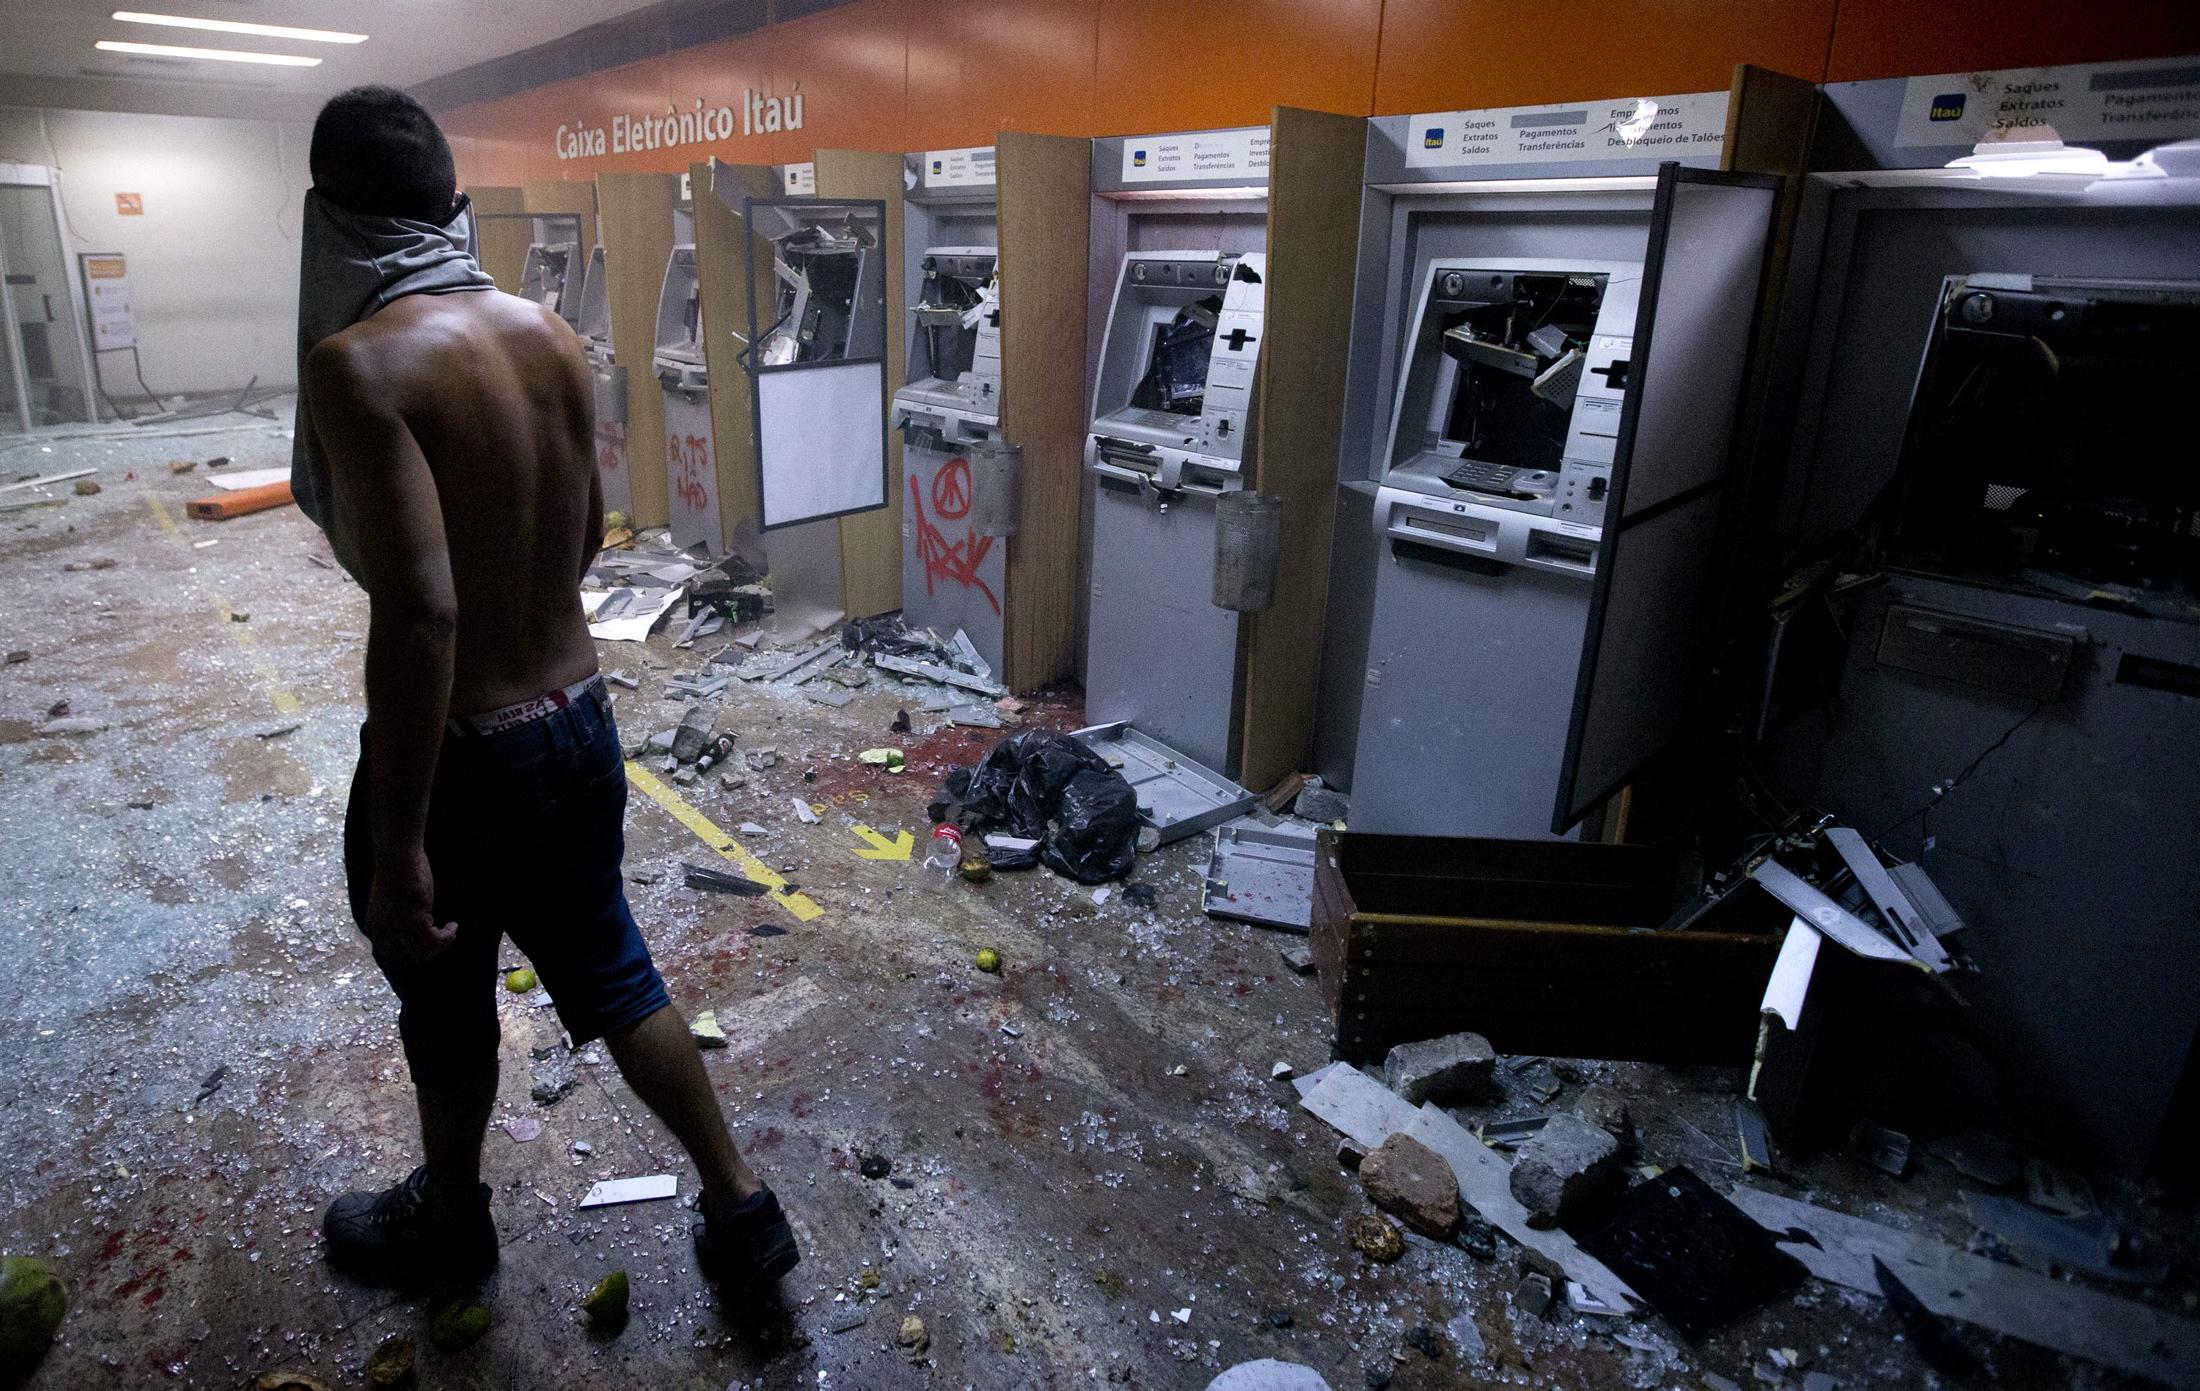 24 - Cash machines in a bank in Rio de Janeiro, Brazil. June 17th 2013